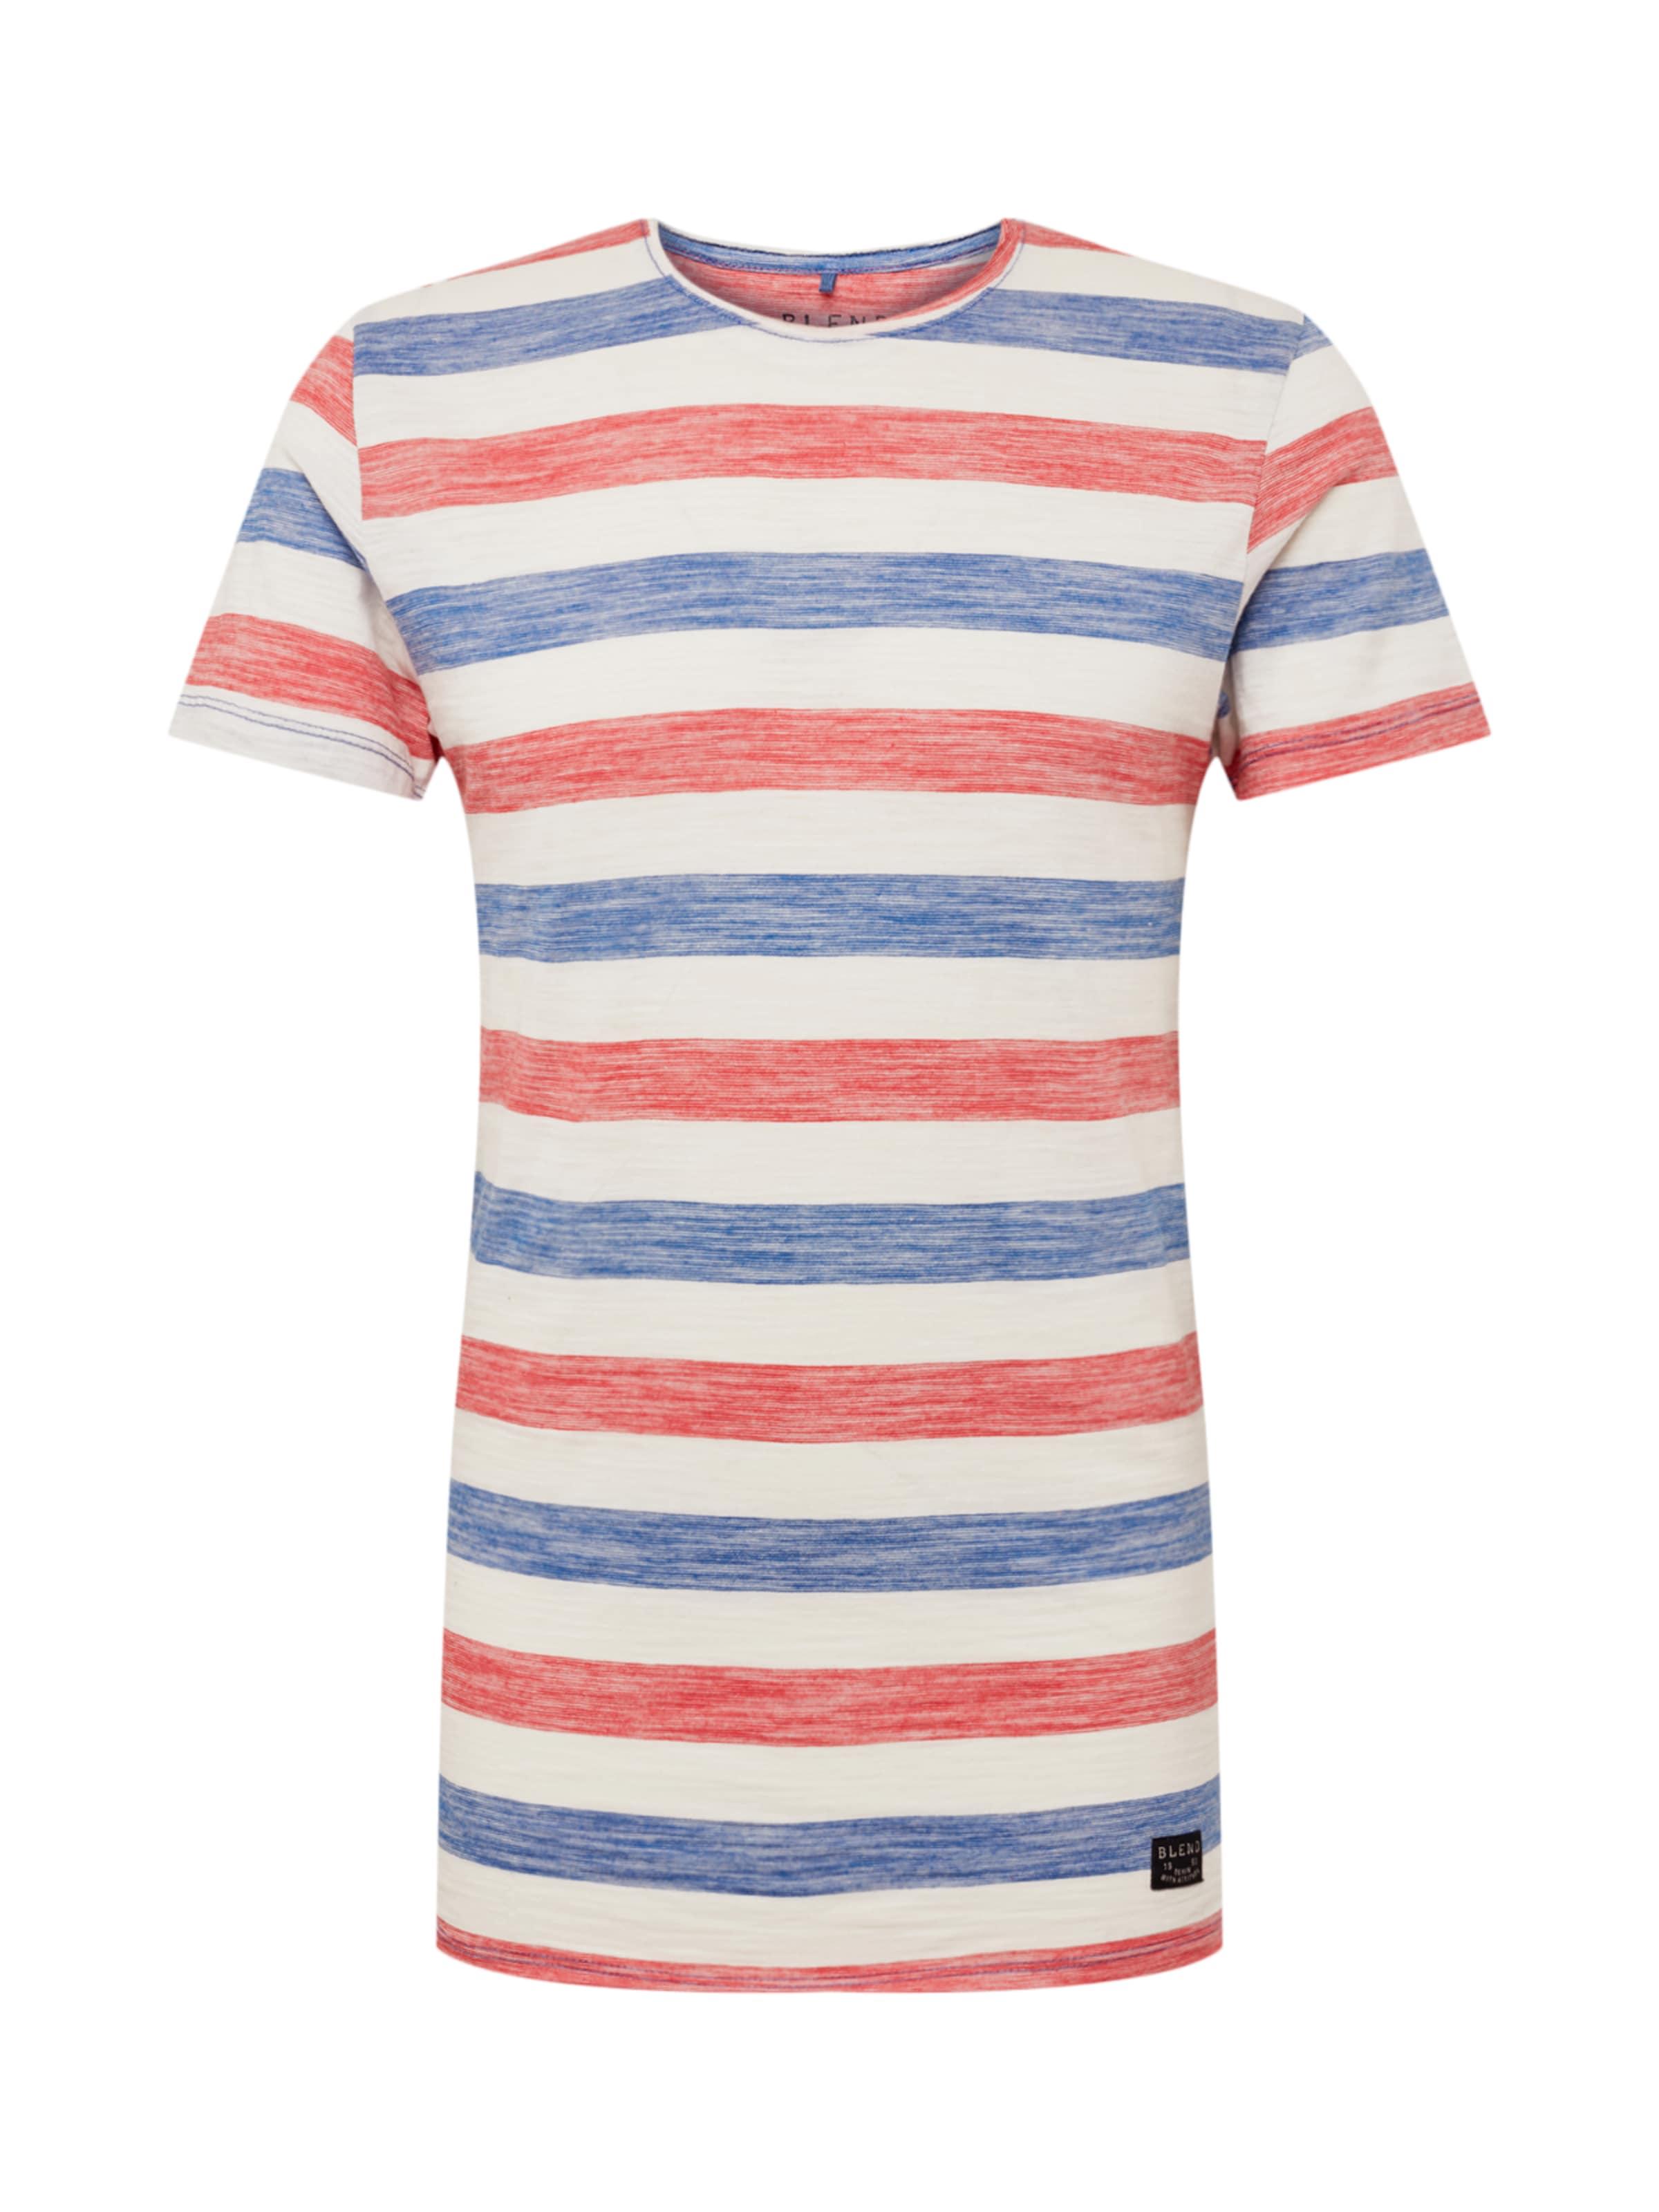 Blend shirt T 'tee' En BleuGris l1JFTKc3